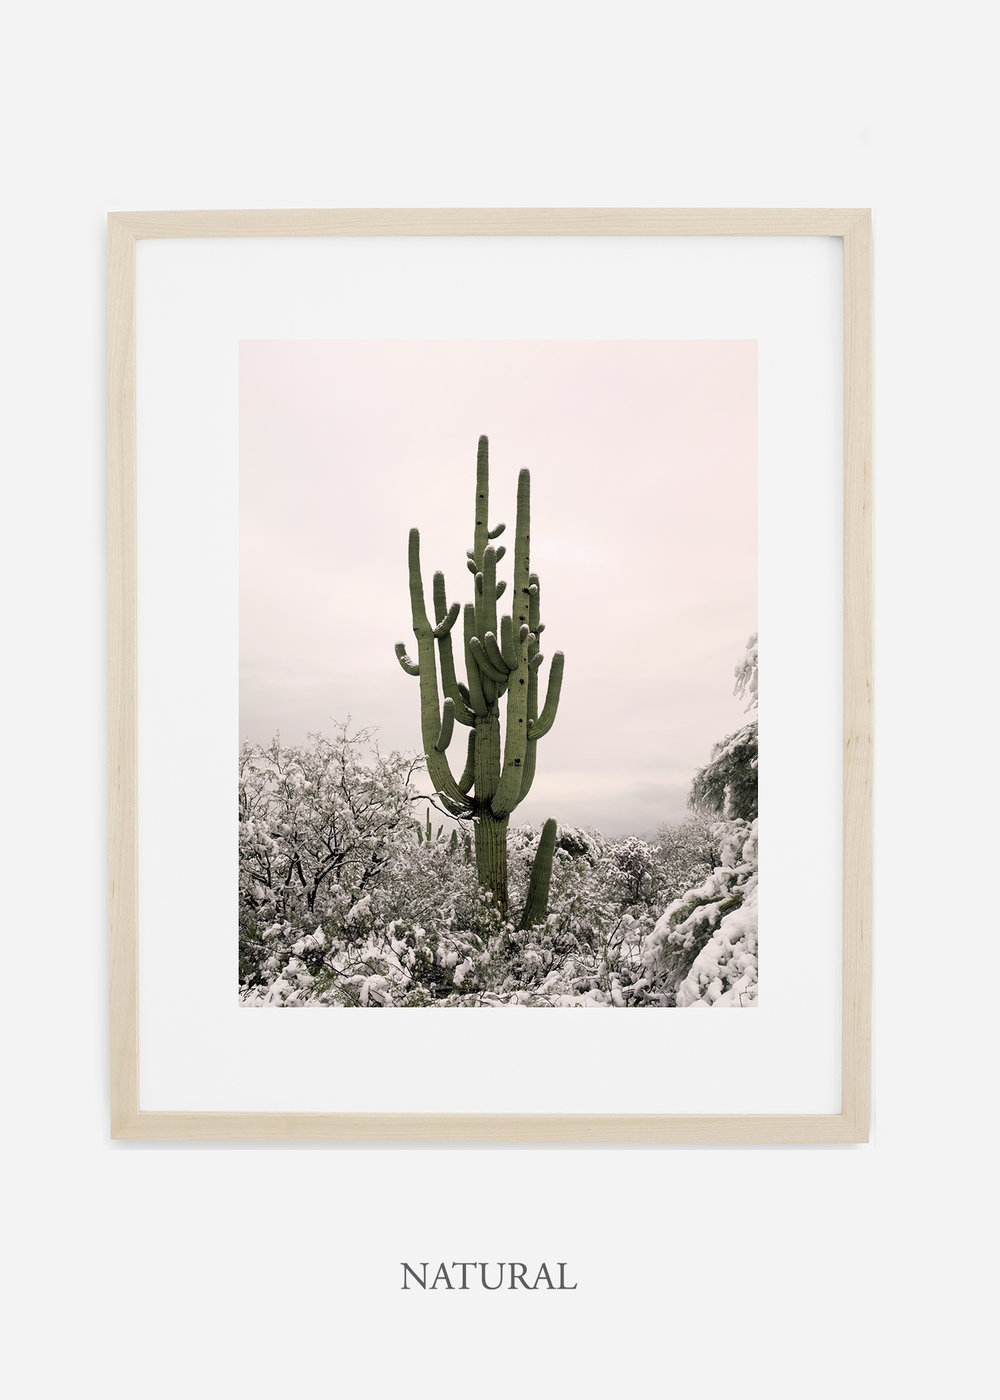 naturalframe-saguaroNo.8-wildercalifornia-art-wallart-cactusprint-homedecor-prints-arizona-botanical-artwork-interiordesign.jpg